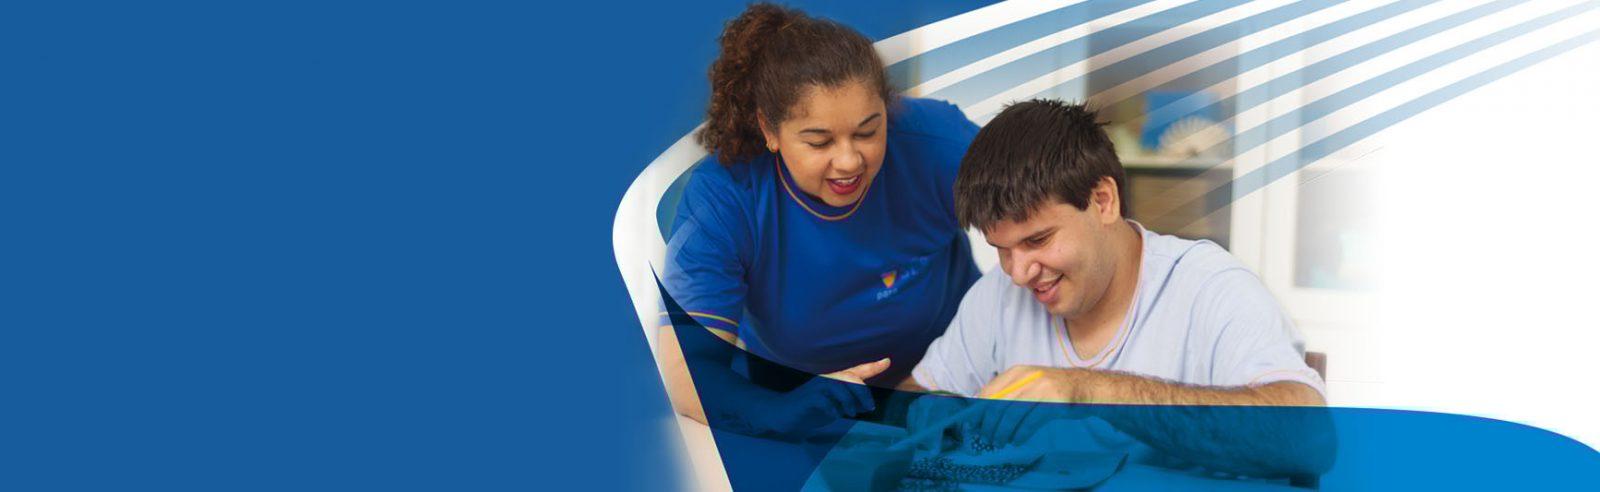 autismo-escola-terapeutica-transdisciplinar-compreensao